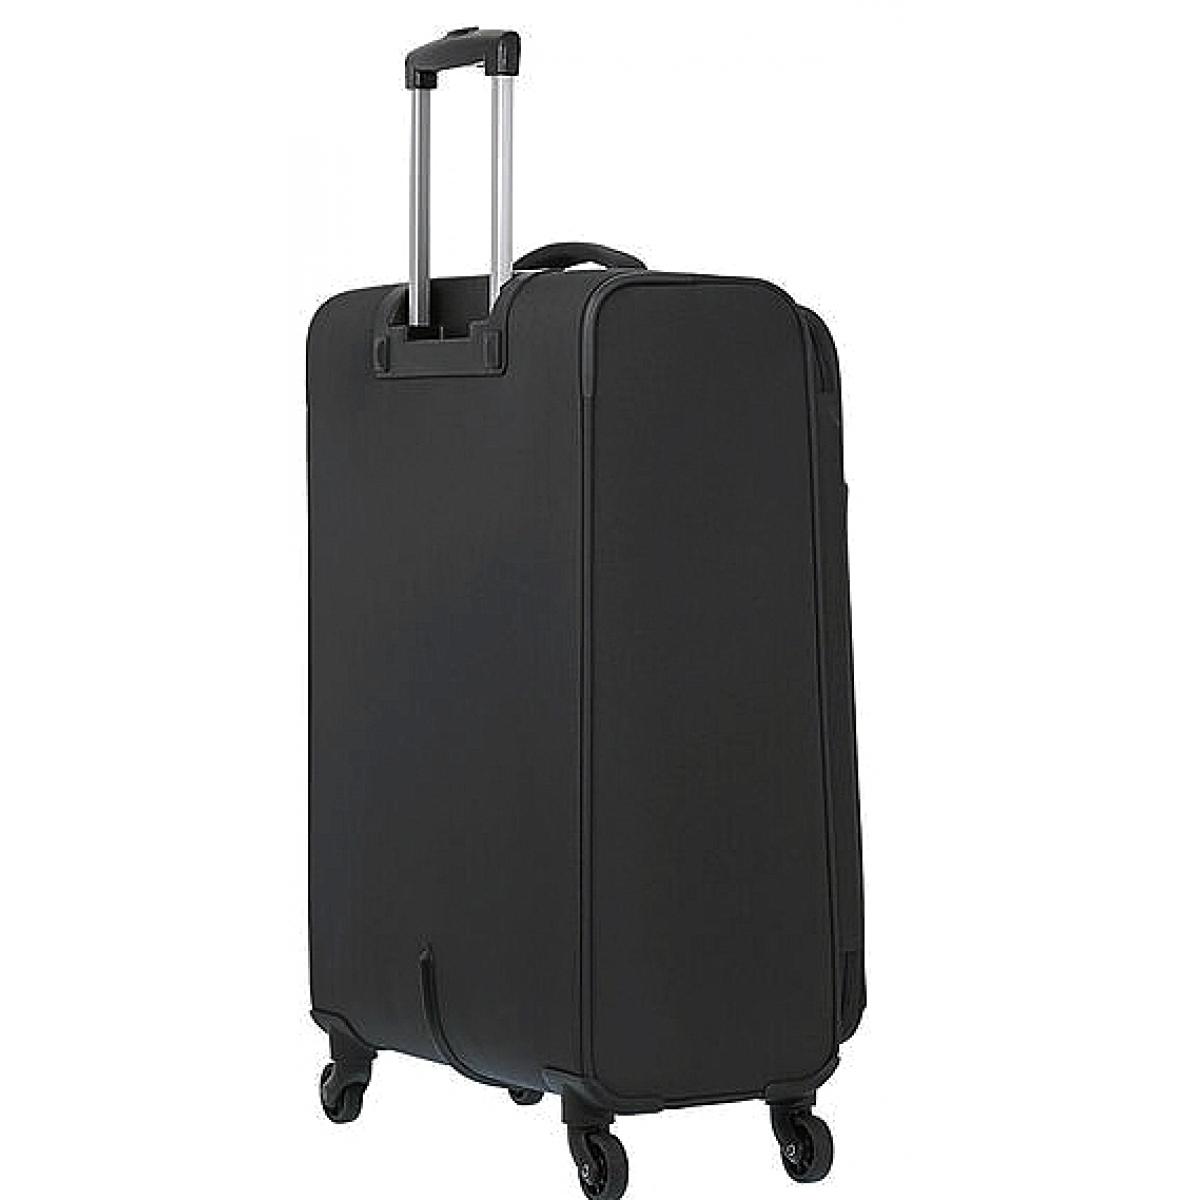 valise american tourister funshine 66cm funshine08. Black Bedroom Furniture Sets. Home Design Ideas